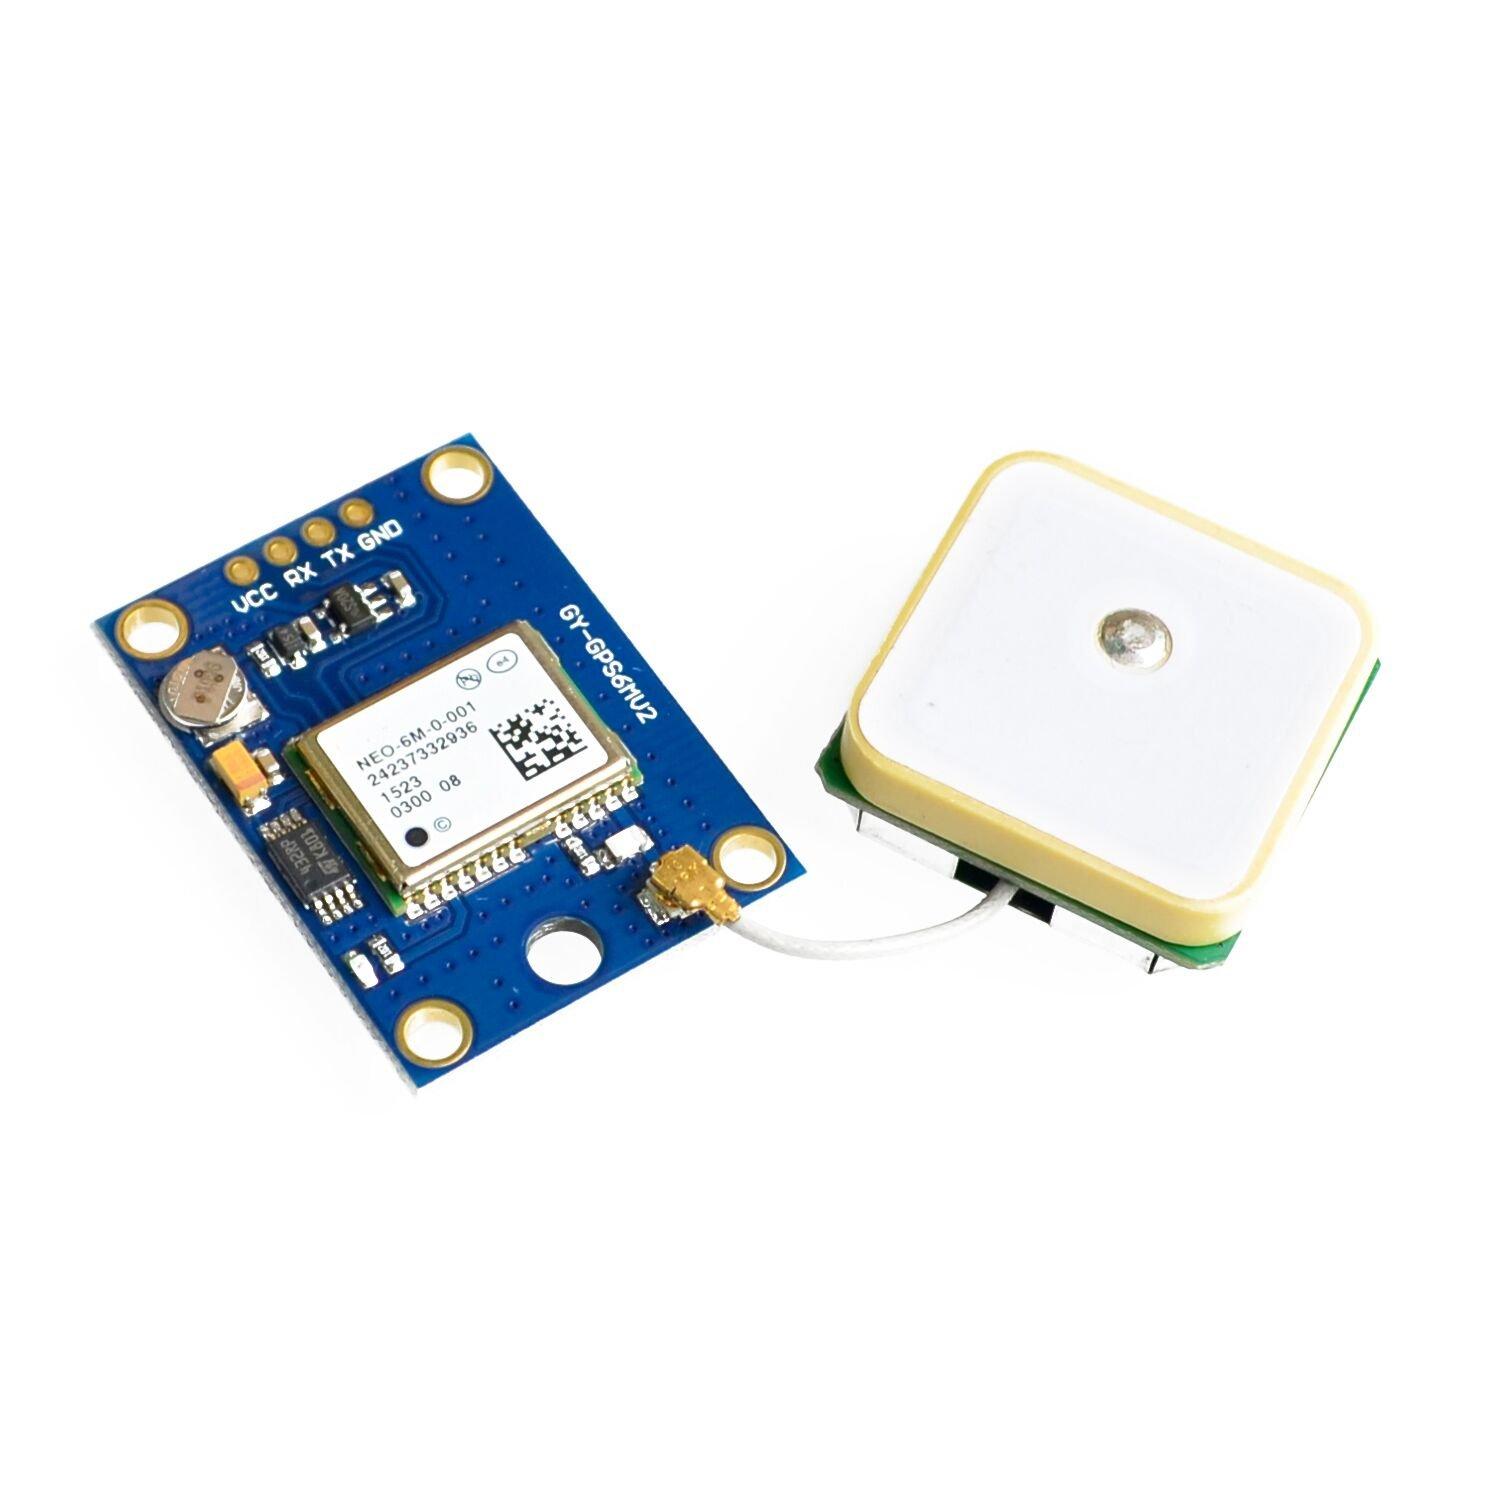 Ants-Store - 10pcs/lot GY-NEO6MV2 new GPS module NEO6MV2 with Flight Control EEPROM MWC APM2.5 large antenna